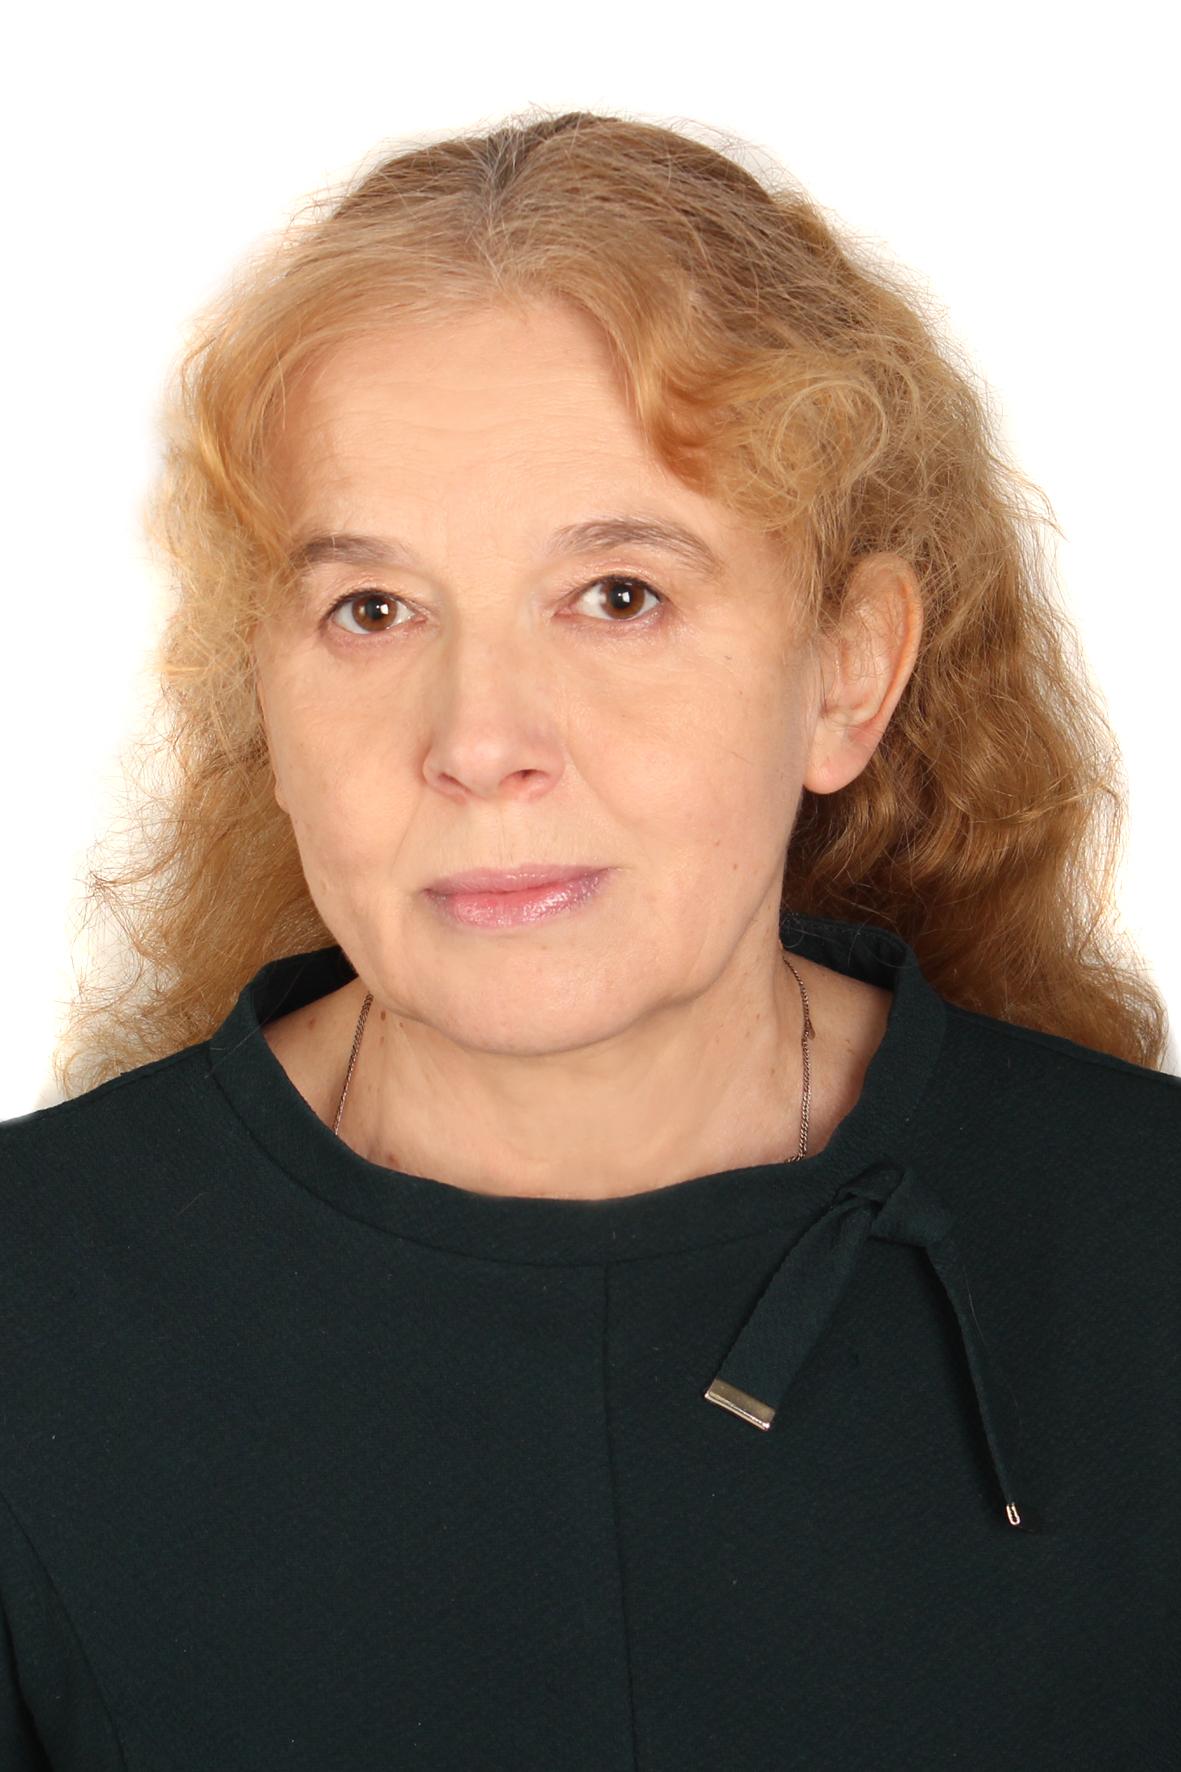 Дороненко Ольга Евгеньевна